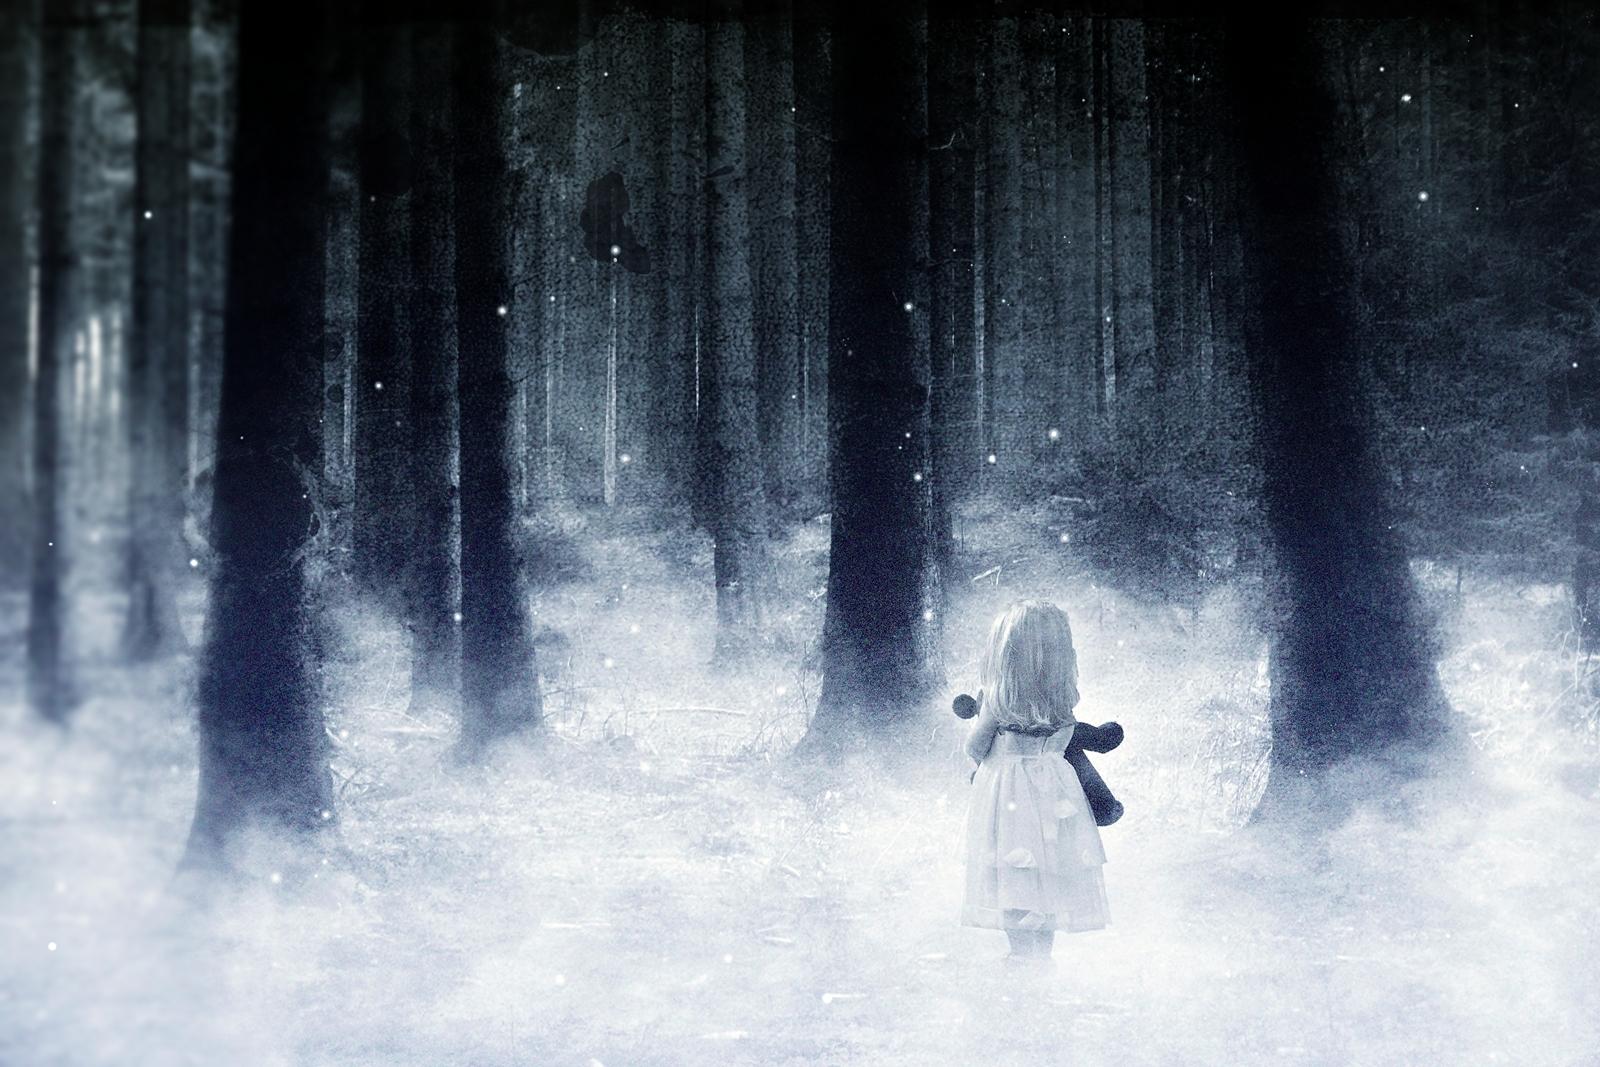 https://i2.wp.com/www.artsyshark.com/wp-content/uploads/2012/07/Summers-Gone-III1.jpg